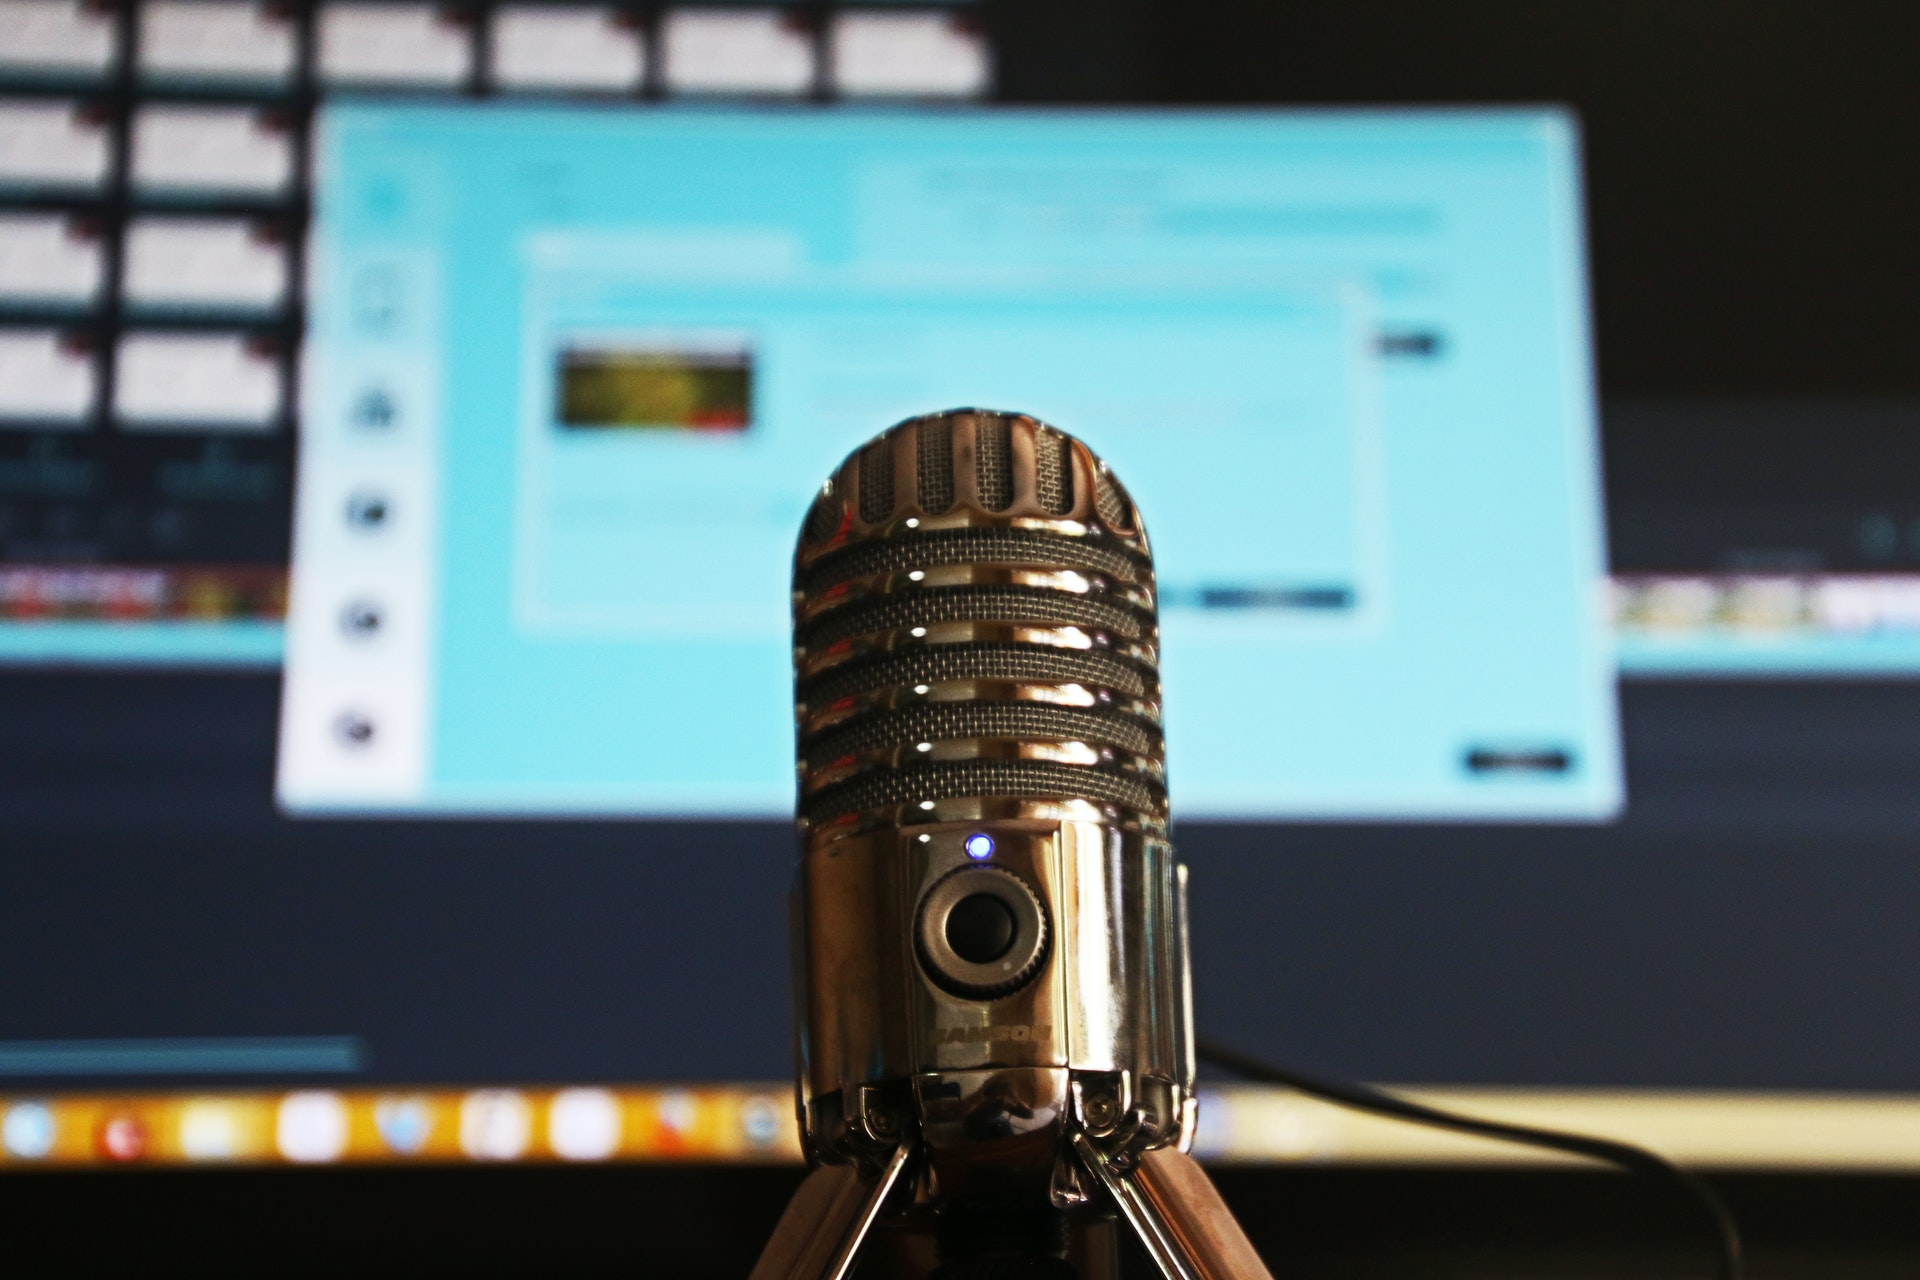 speech recognition engine